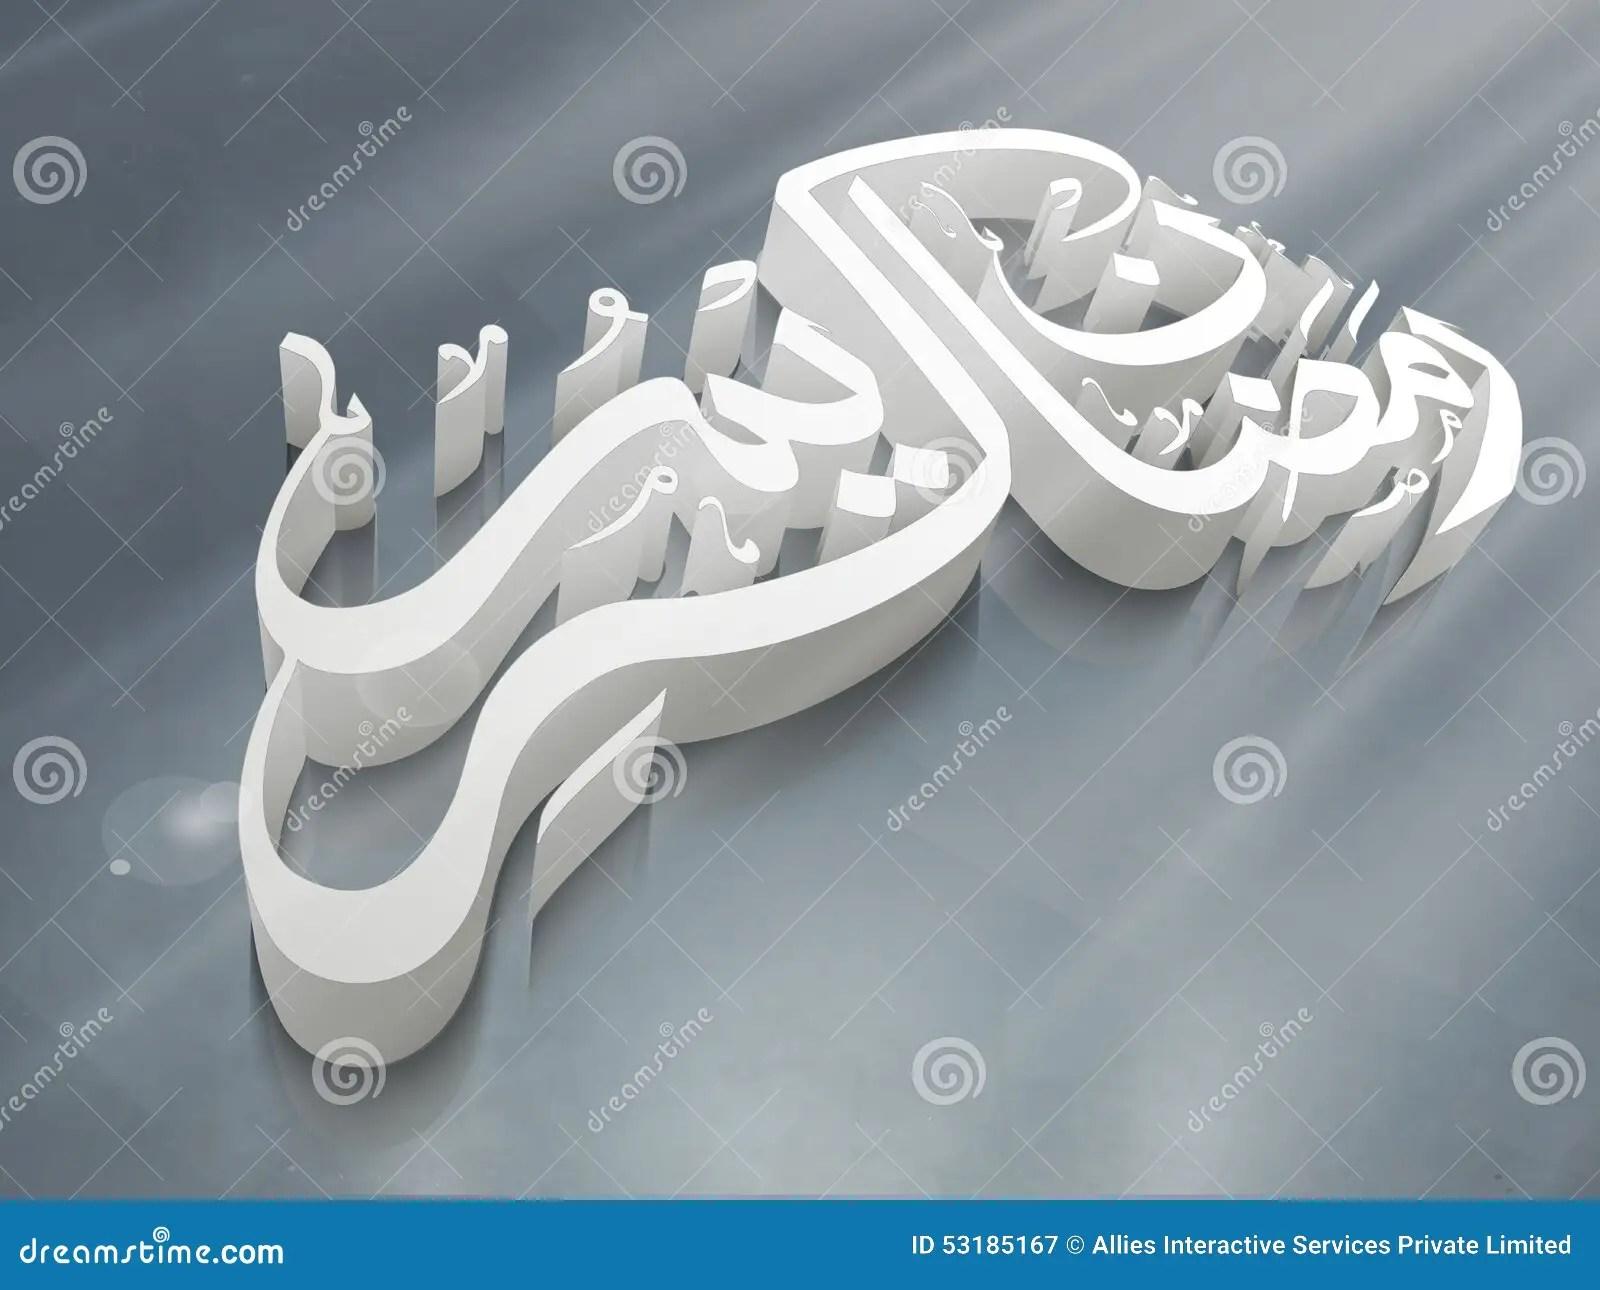 Masha Allah Hd Wallpaper Ramadan Kareem Celebration With 3d Text Stock